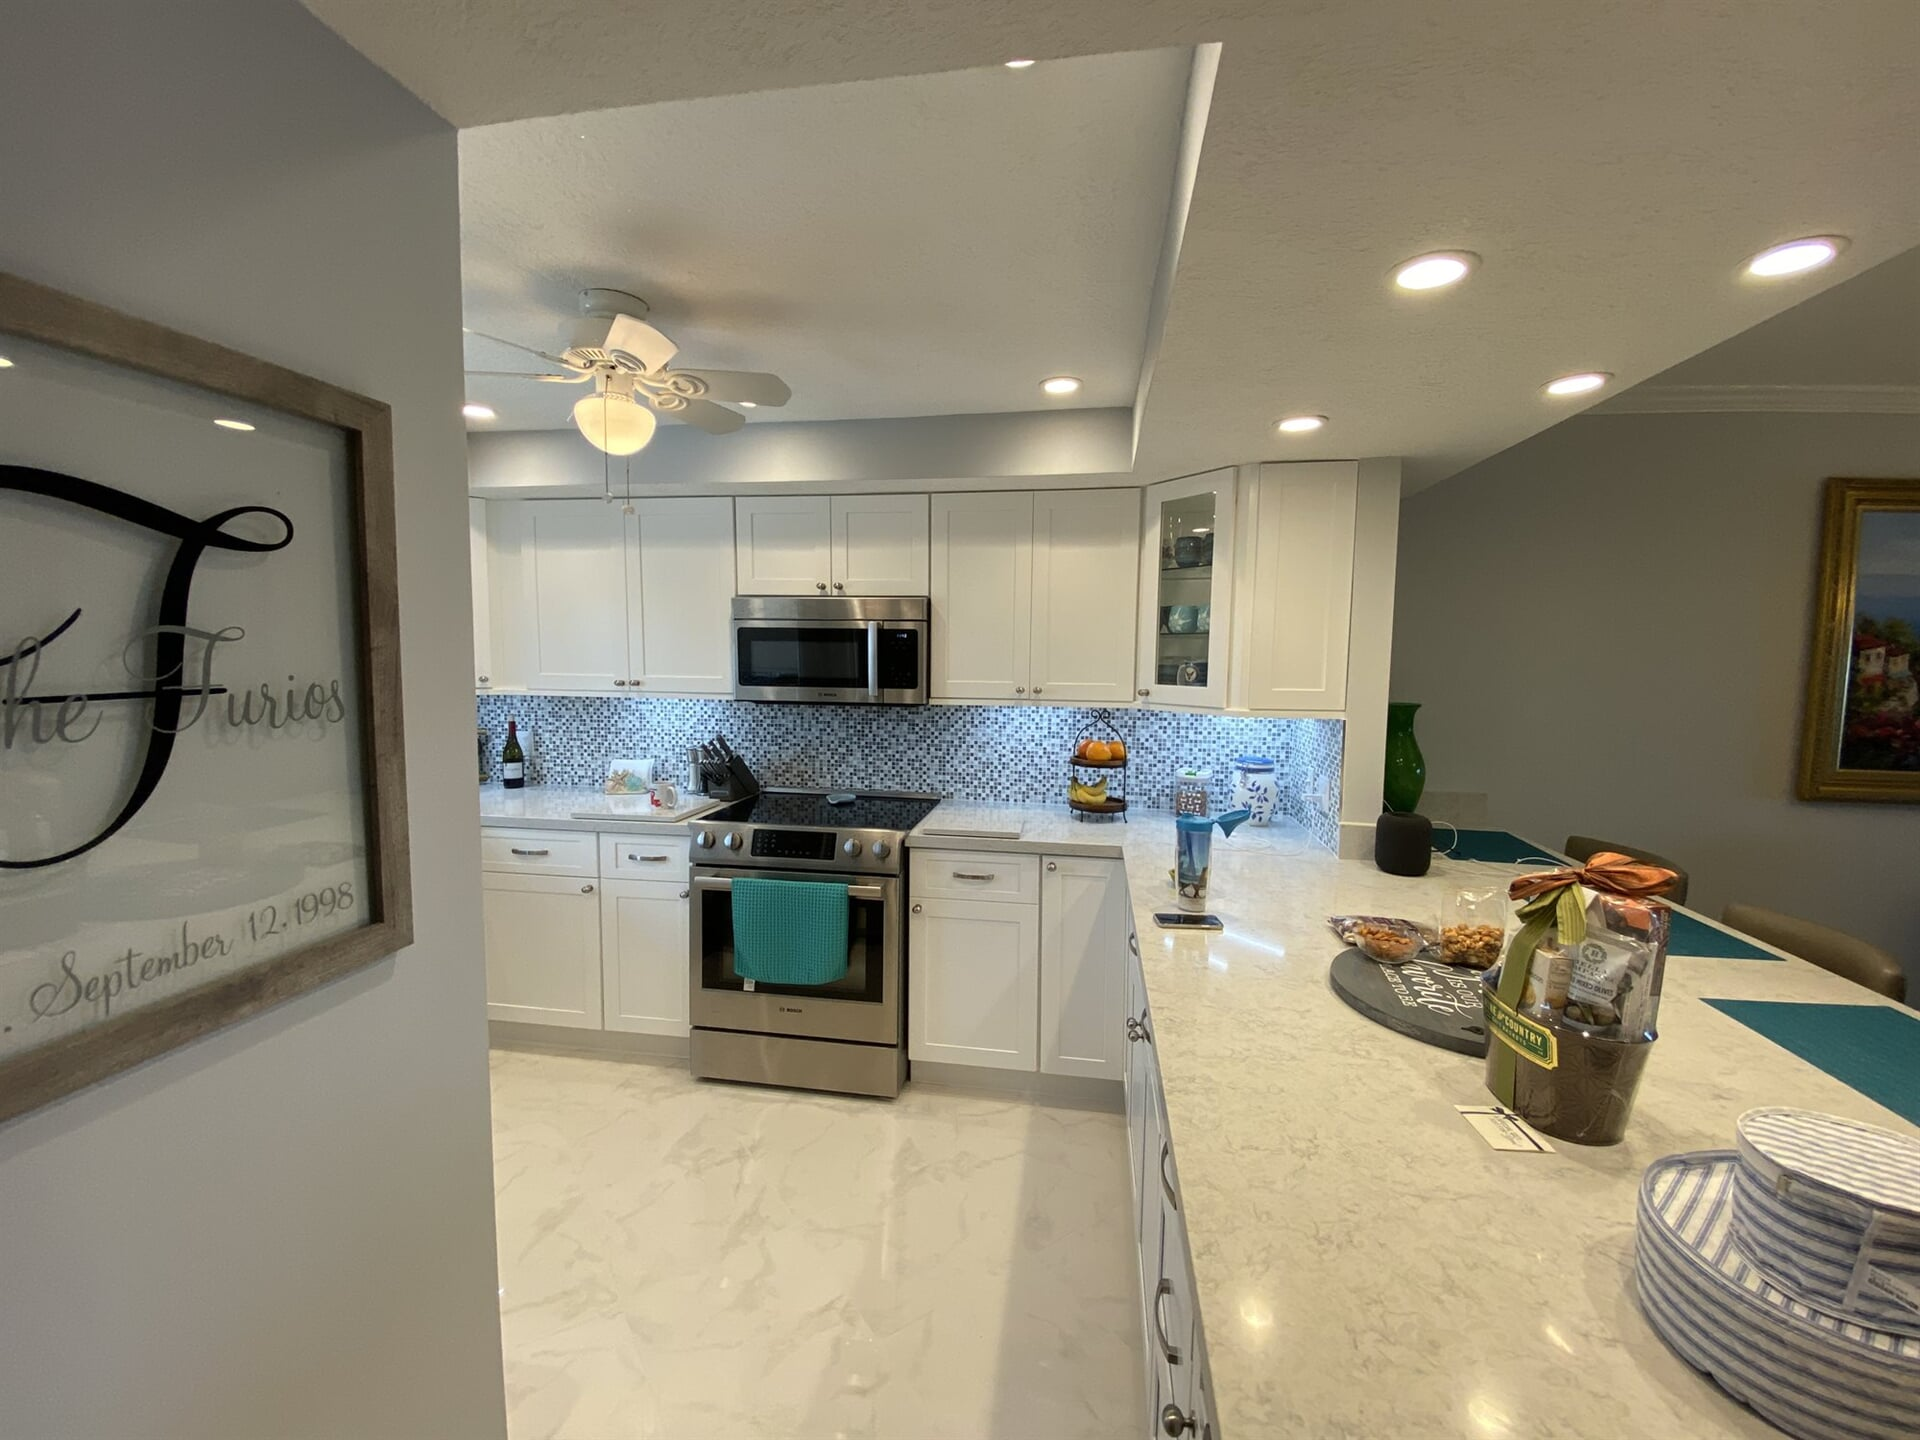 Kitchen remodel in Jupiter, FL from Floors For You Kitchen & Bath